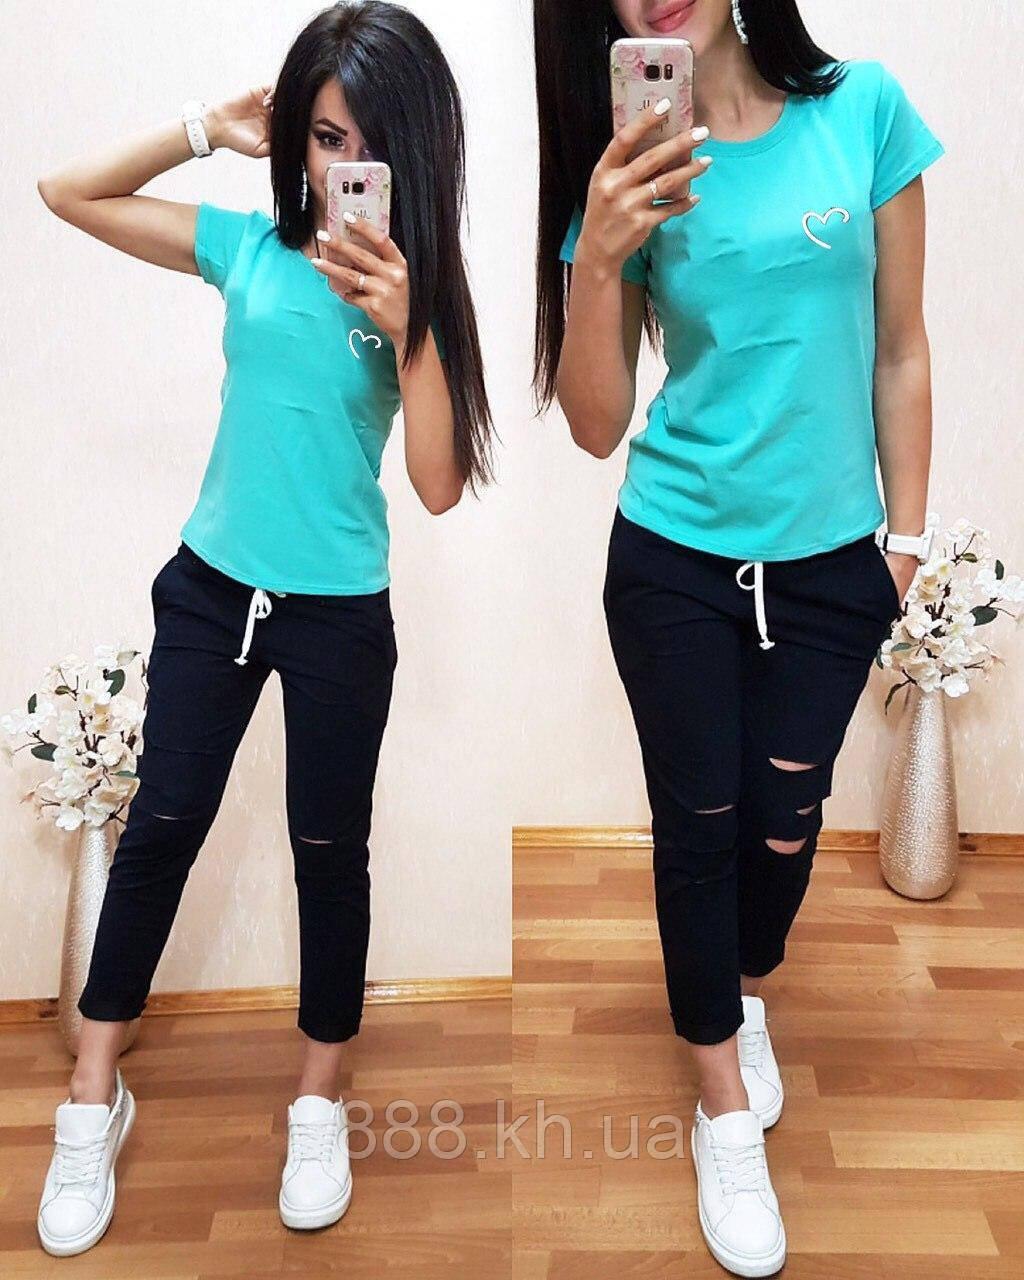 Женская футболка на лето, легкая футболка для девочек S/M/L/XL бирюза